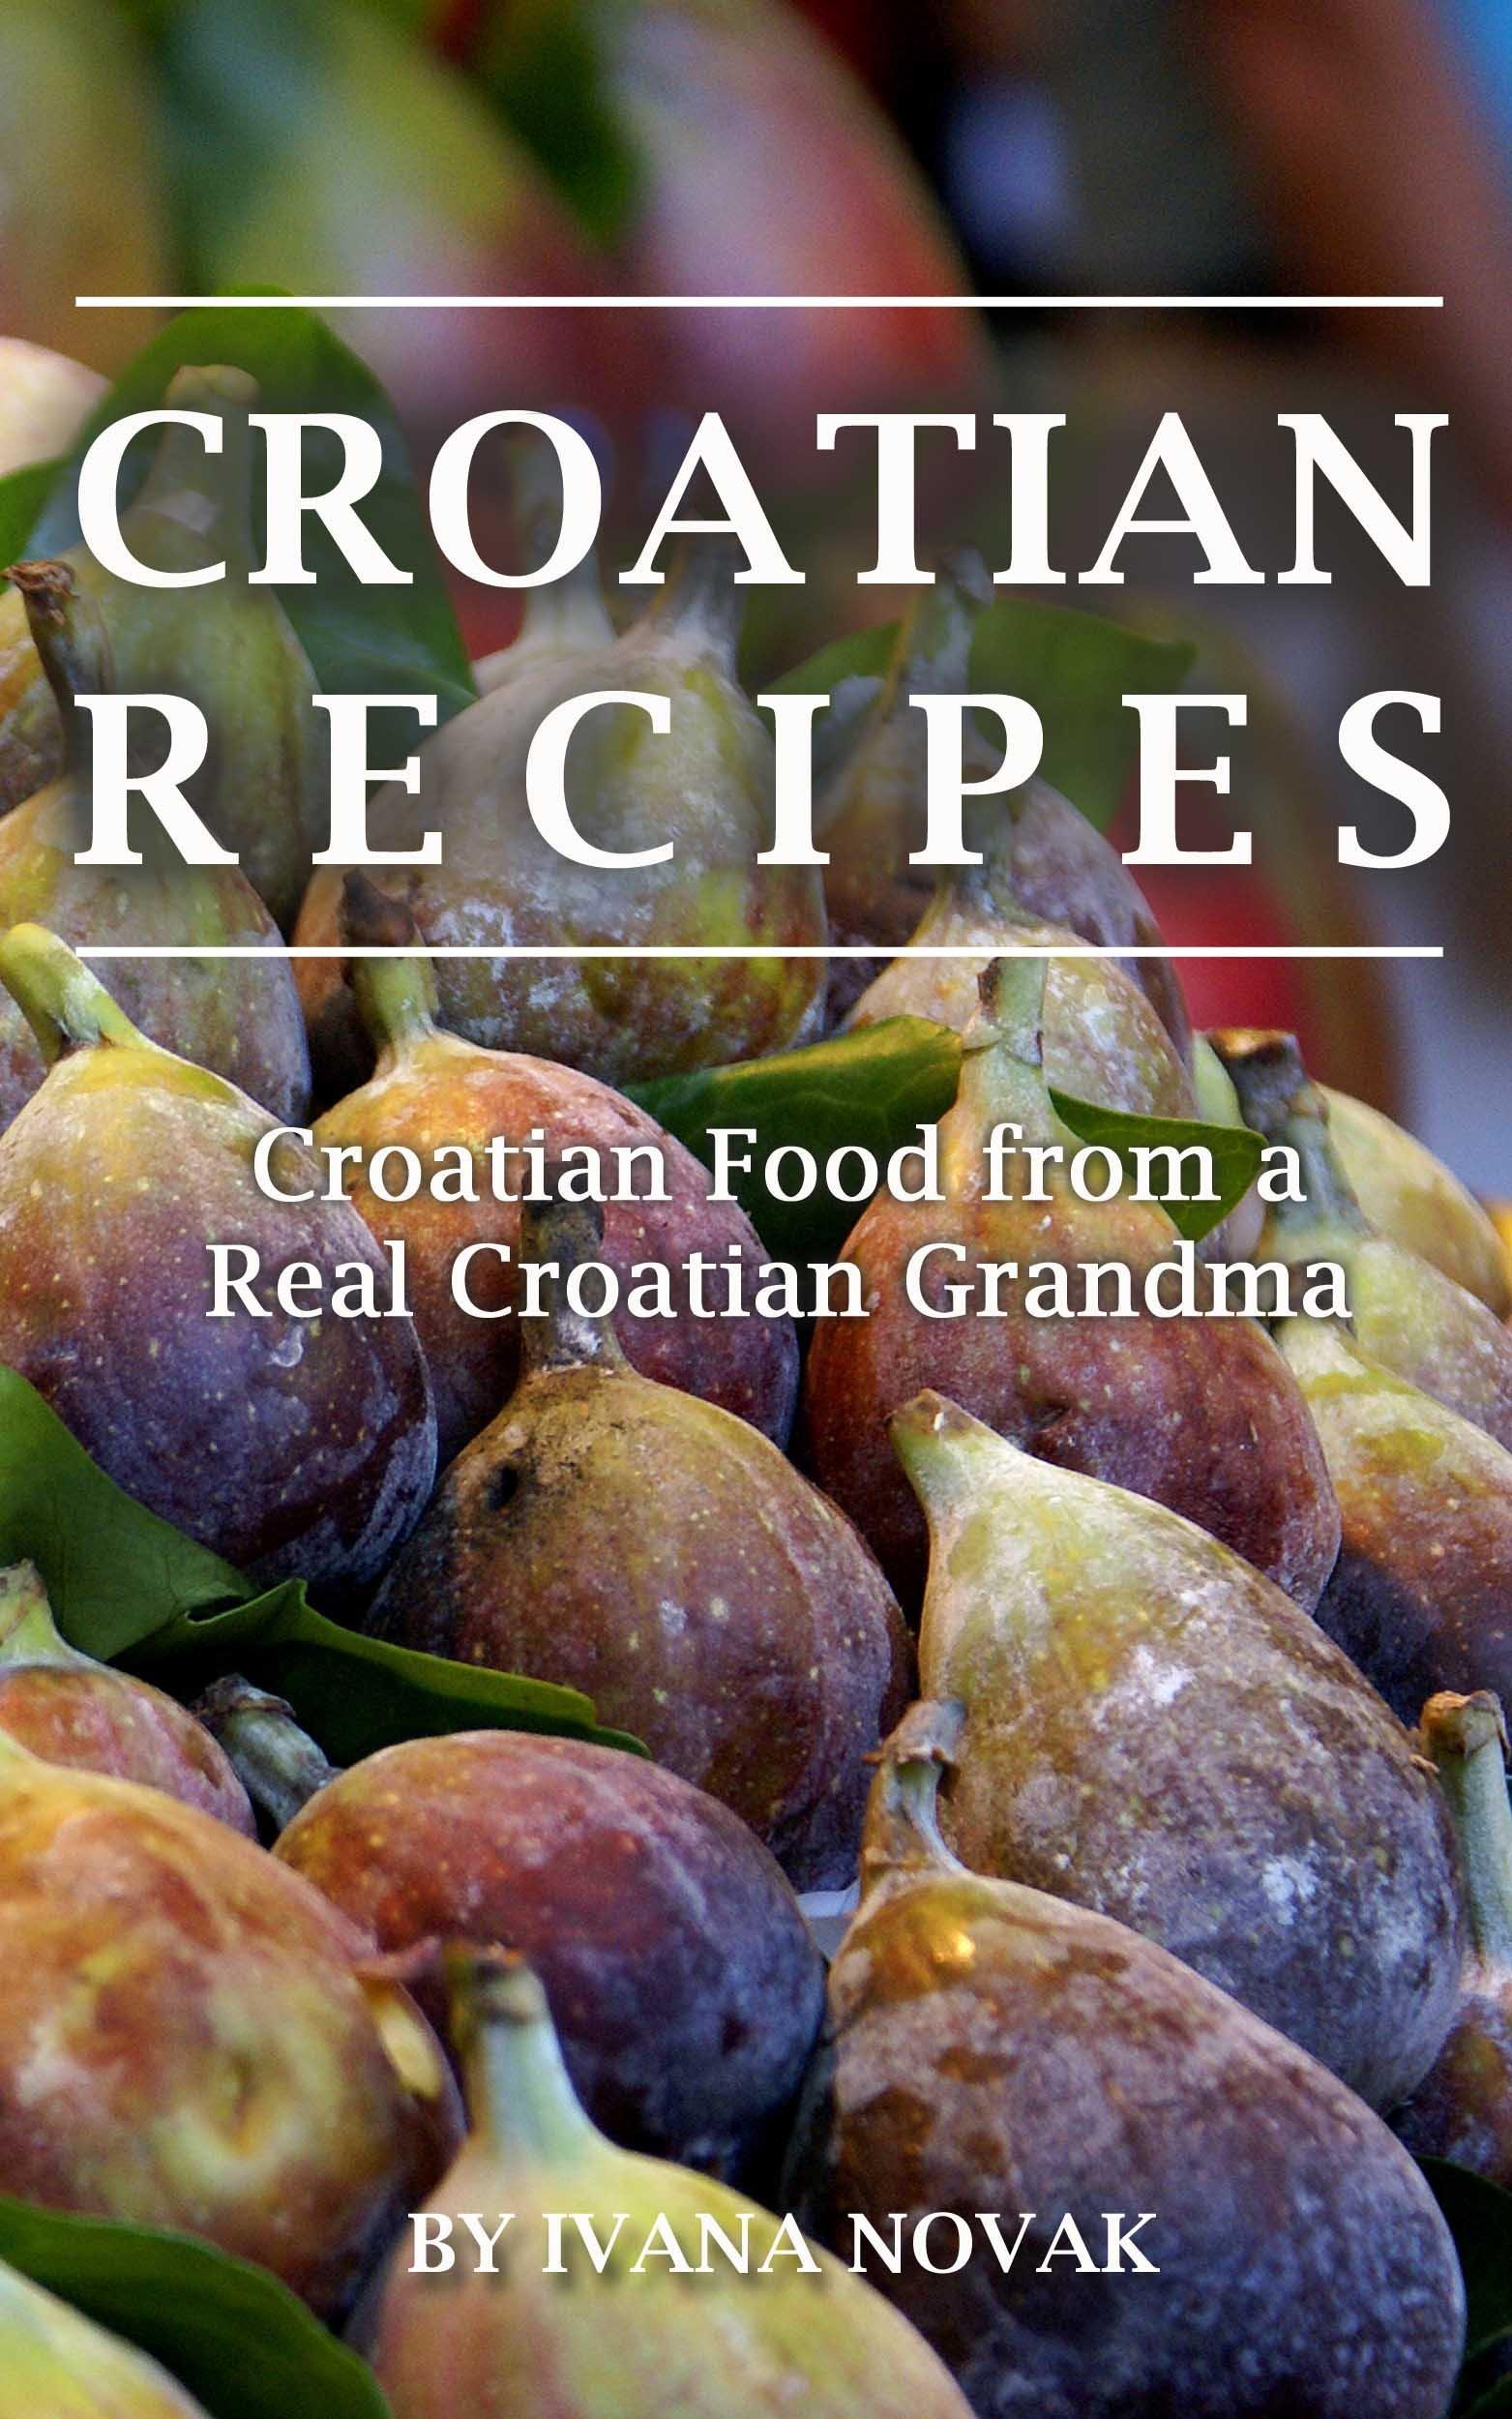 Croatian Recipes  Croatian Food From A Real Croatian Grandma  Real Croatian Cuisine  Croatian Recipes Croatian Food Croatian Cookbook   English Edition